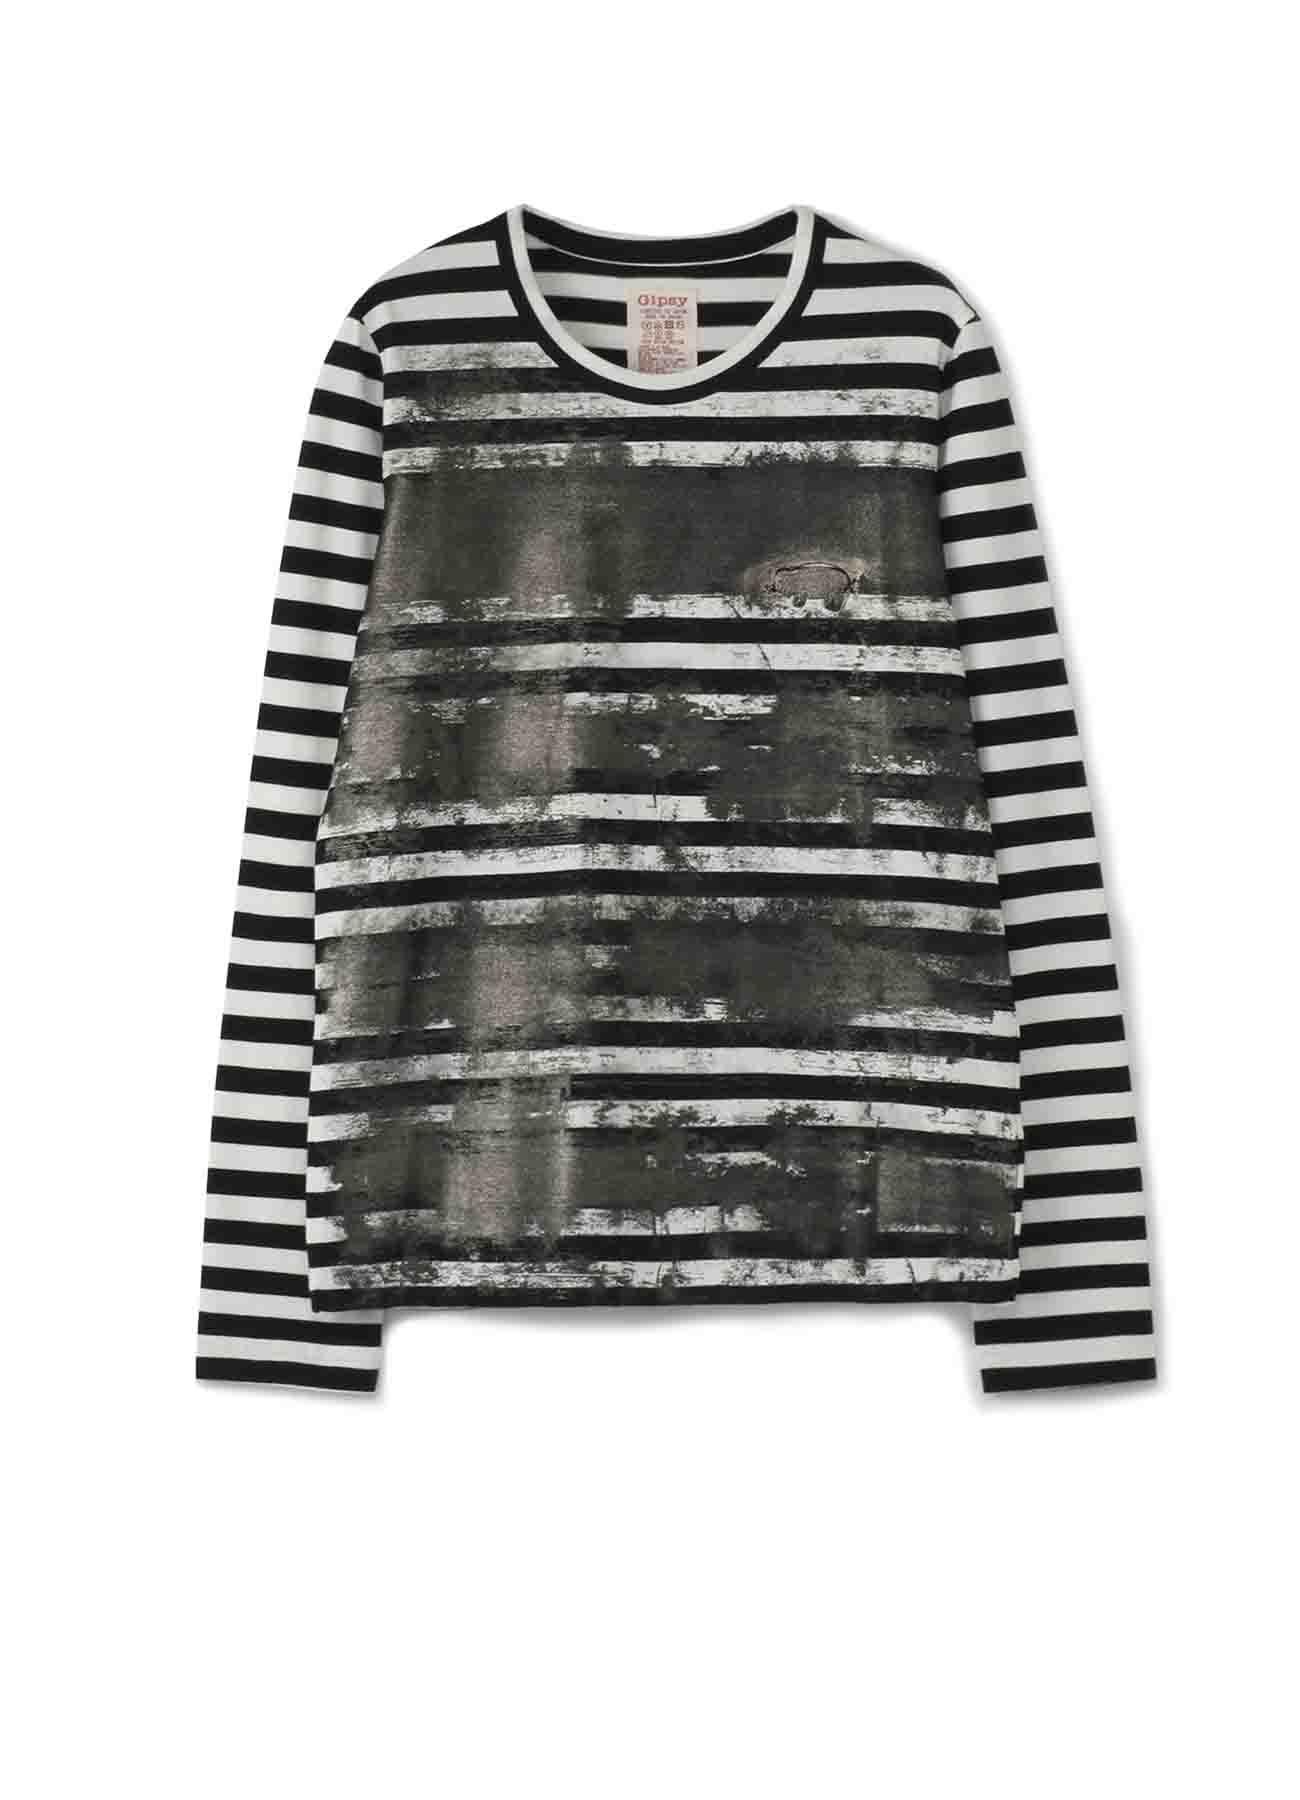 Gipsy 金属颜料涂抹条纹长袖T恤